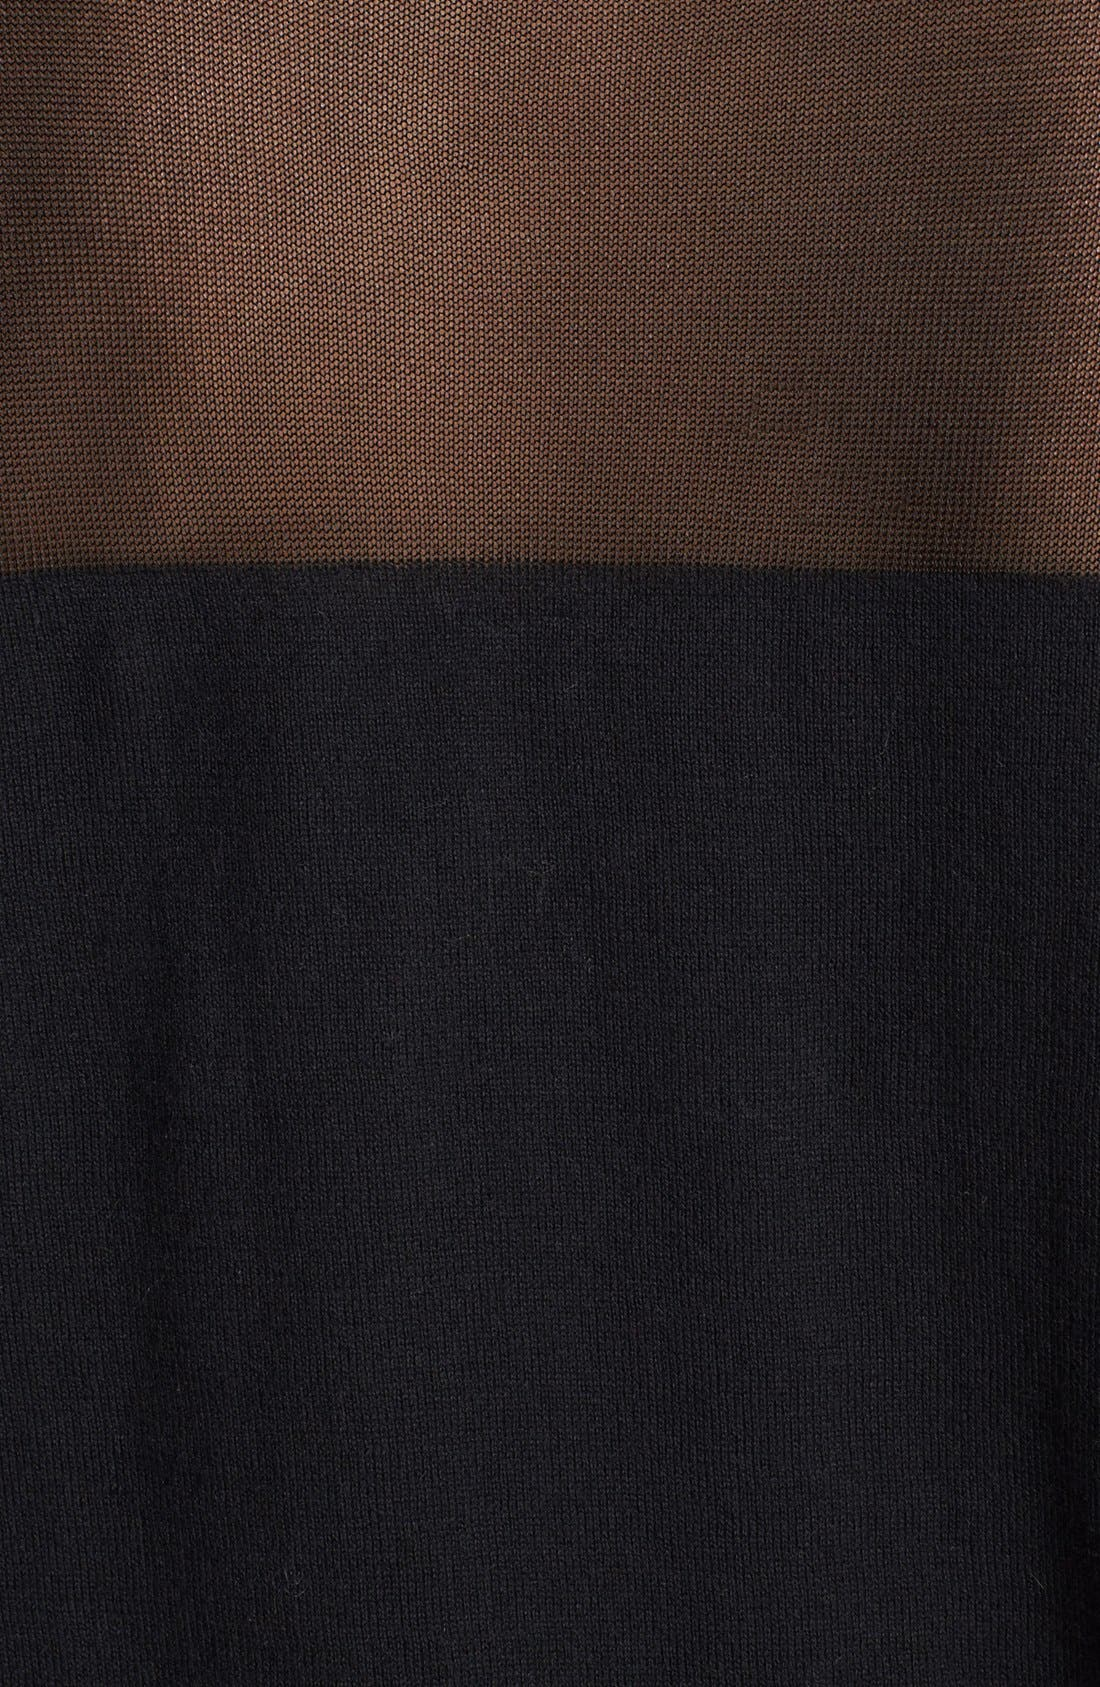 Alternate Image 5  - Vince Camuto Illusion Mix Sweater (Regular & Petite)